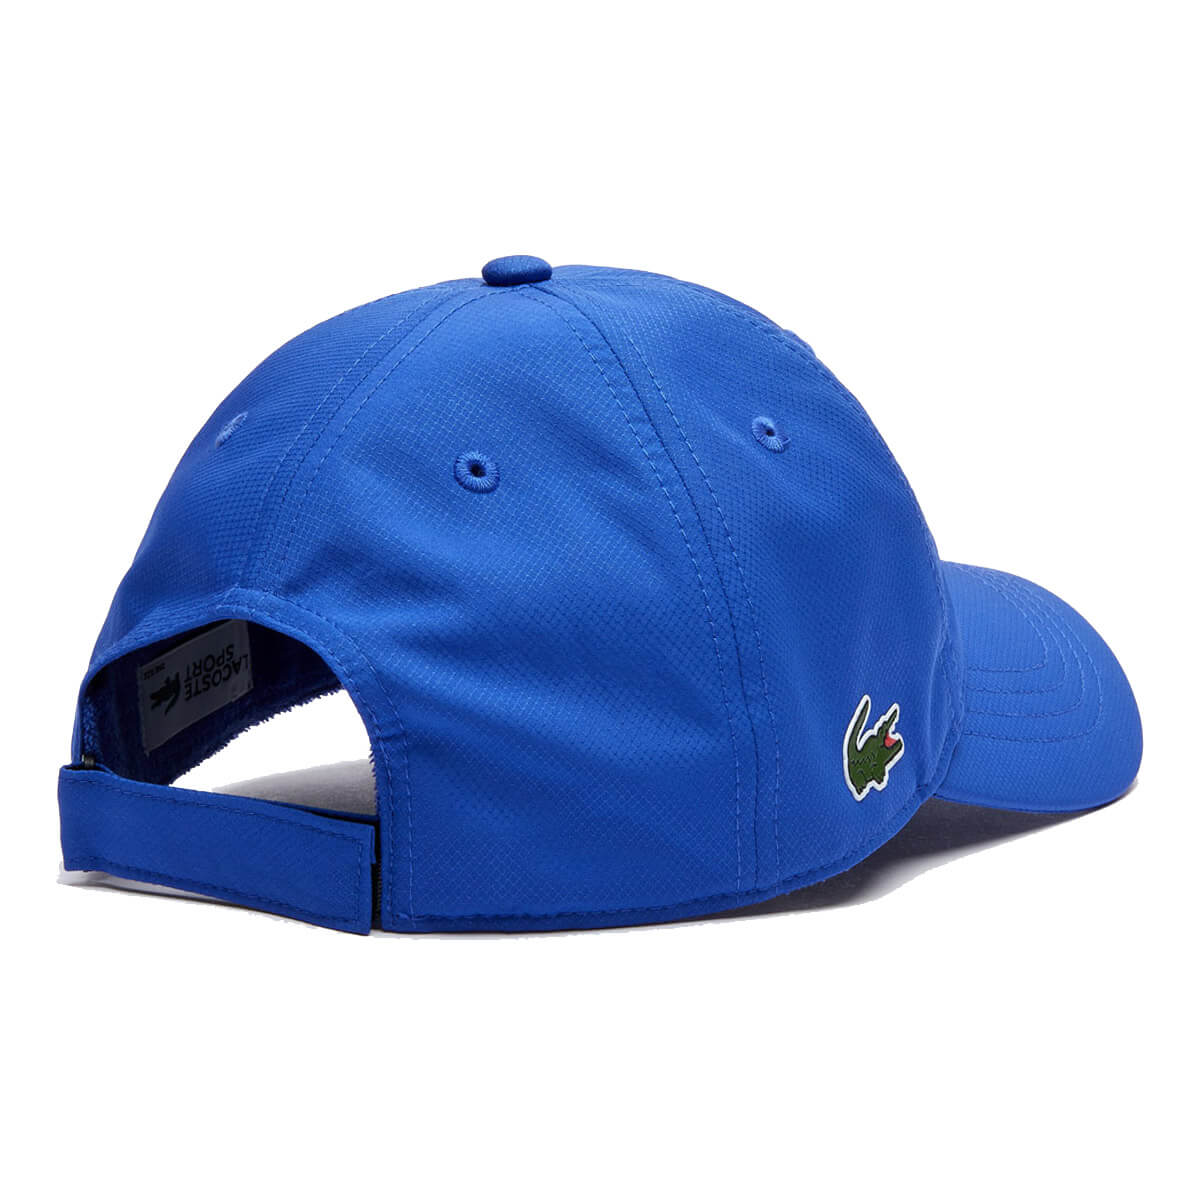 Lacoste-Mens-2020-Sports-Weave-Taffeta-Solid-Diamond-Baseball-Cap thumbnail 8